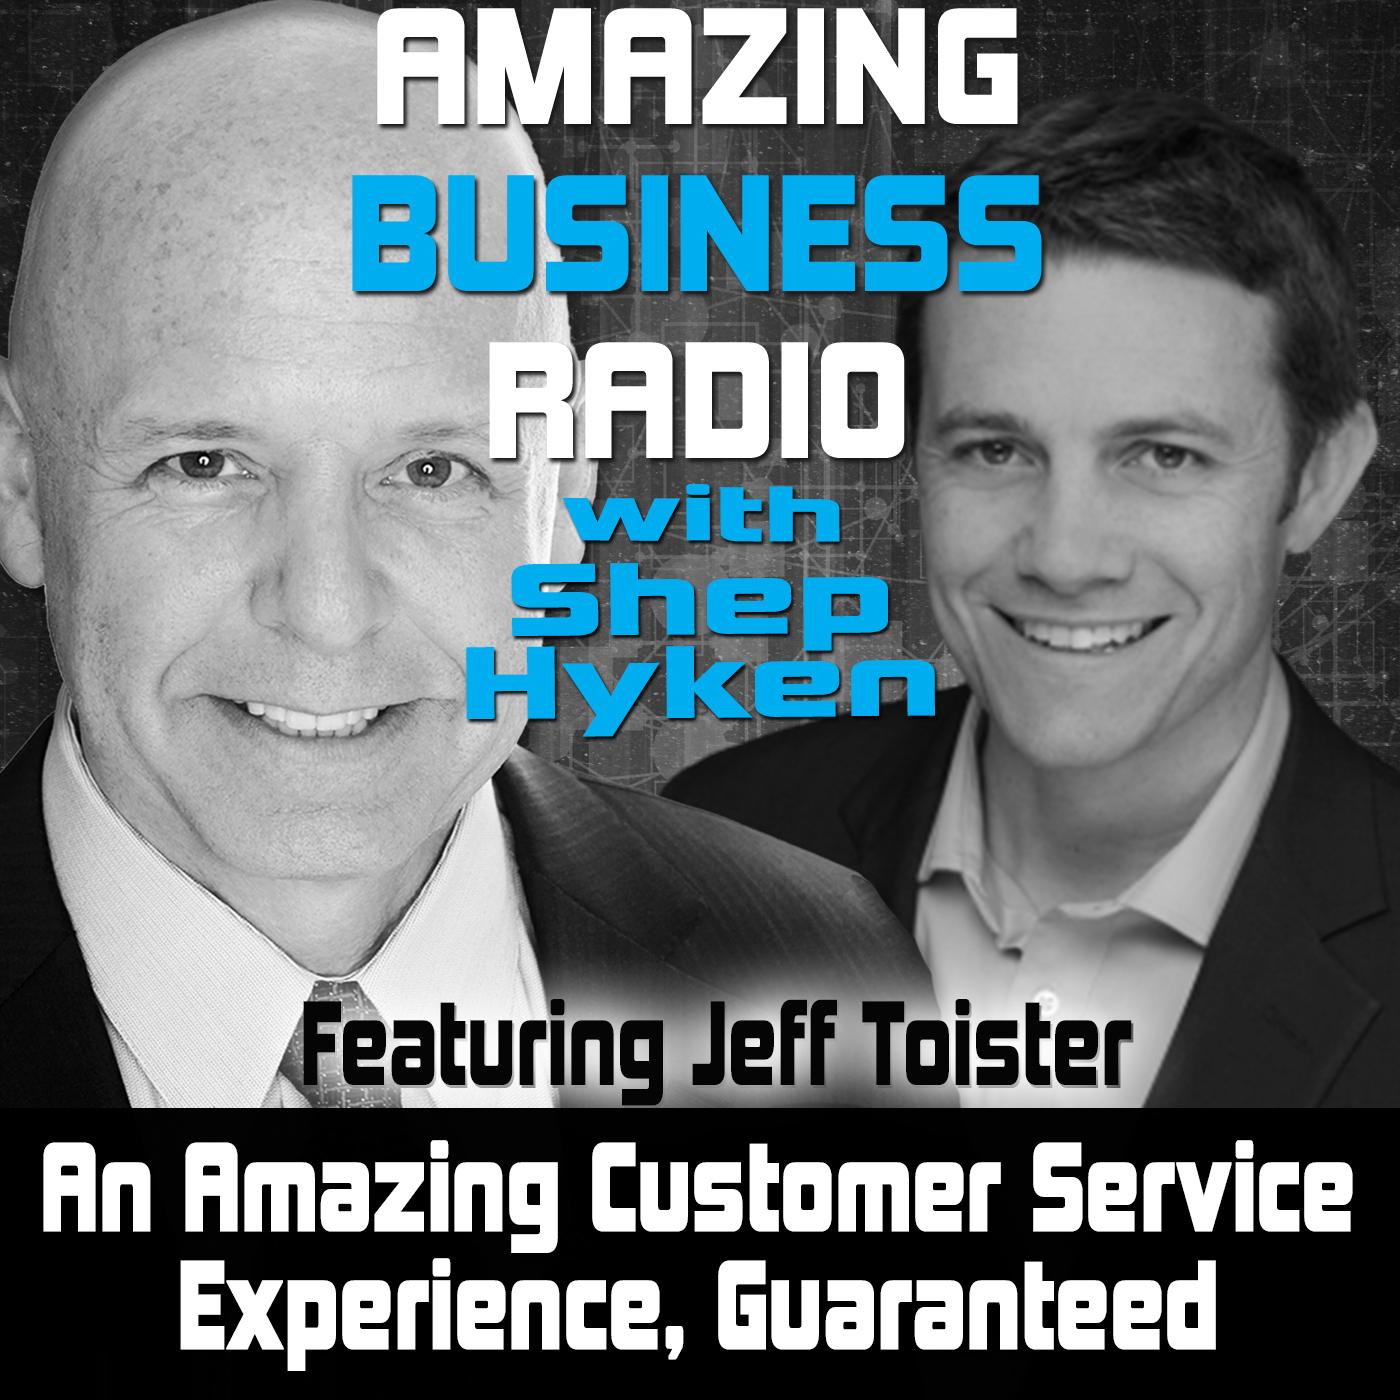 Amazing Business Radio: Jeff Toister